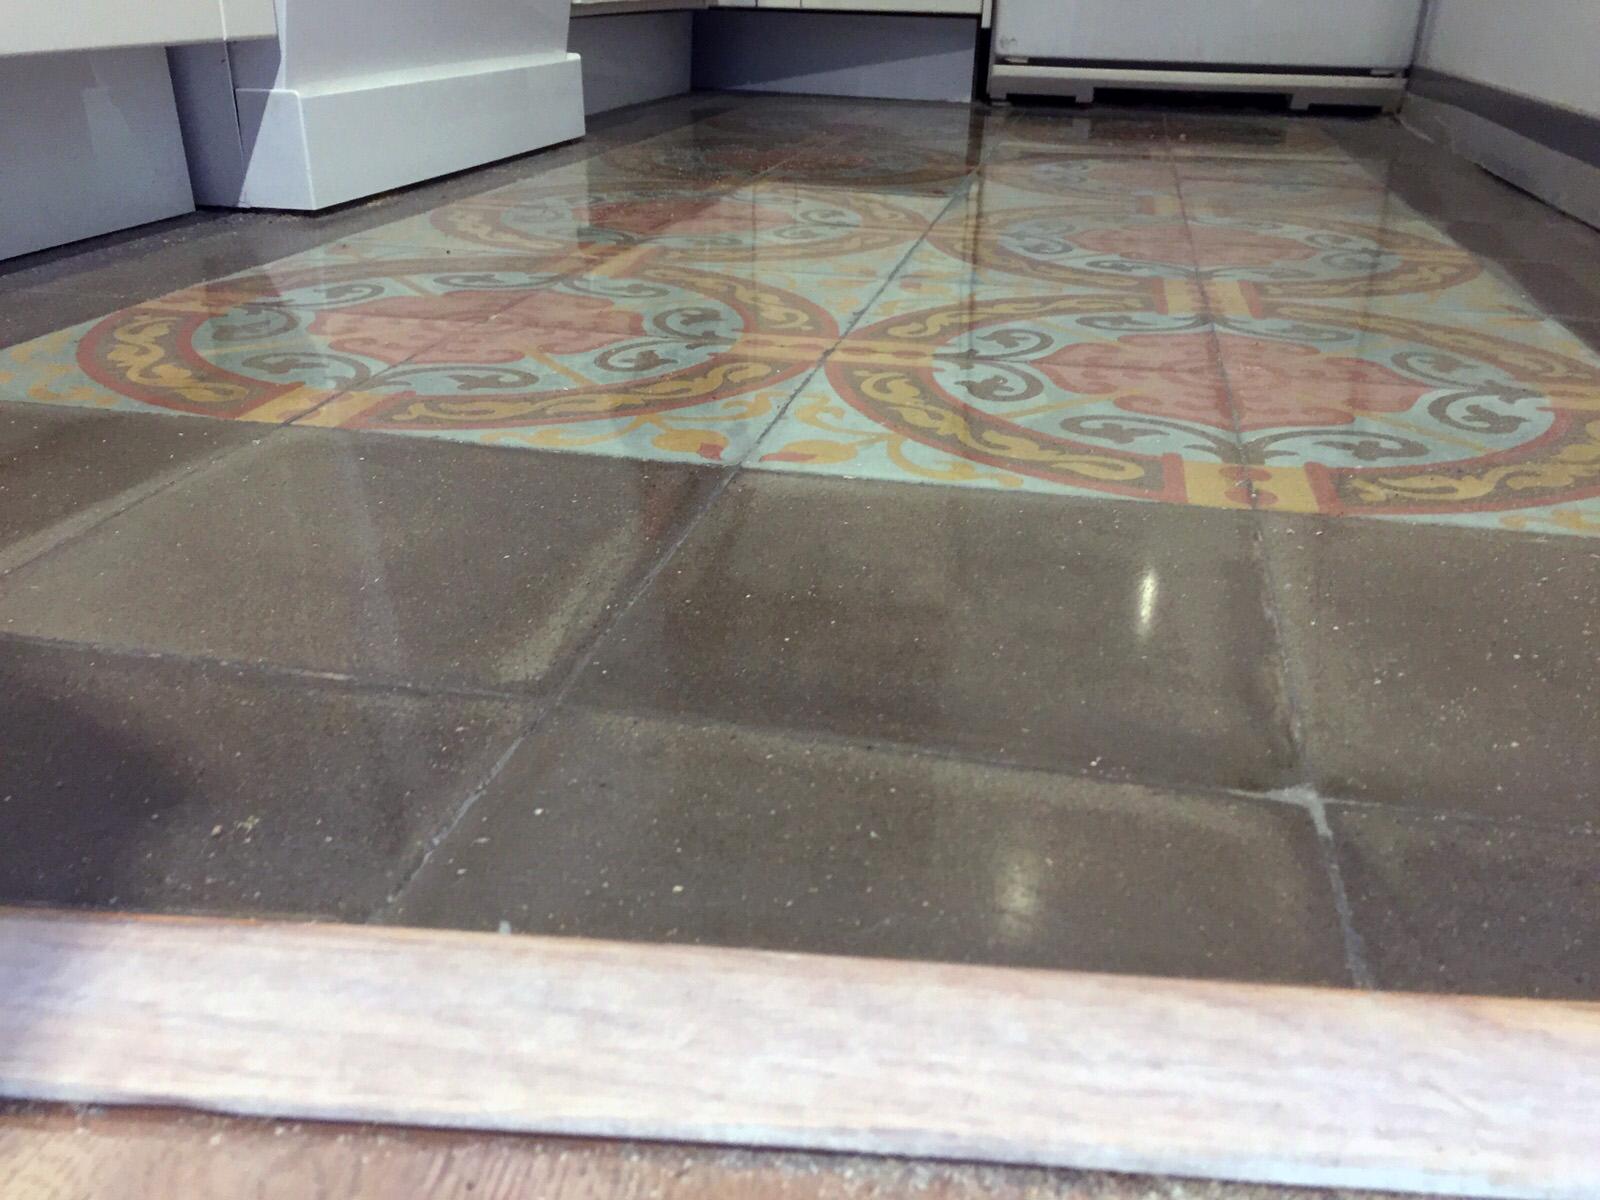 Suelo-de-mosaico-nolla-restaurado-en-Barcelona